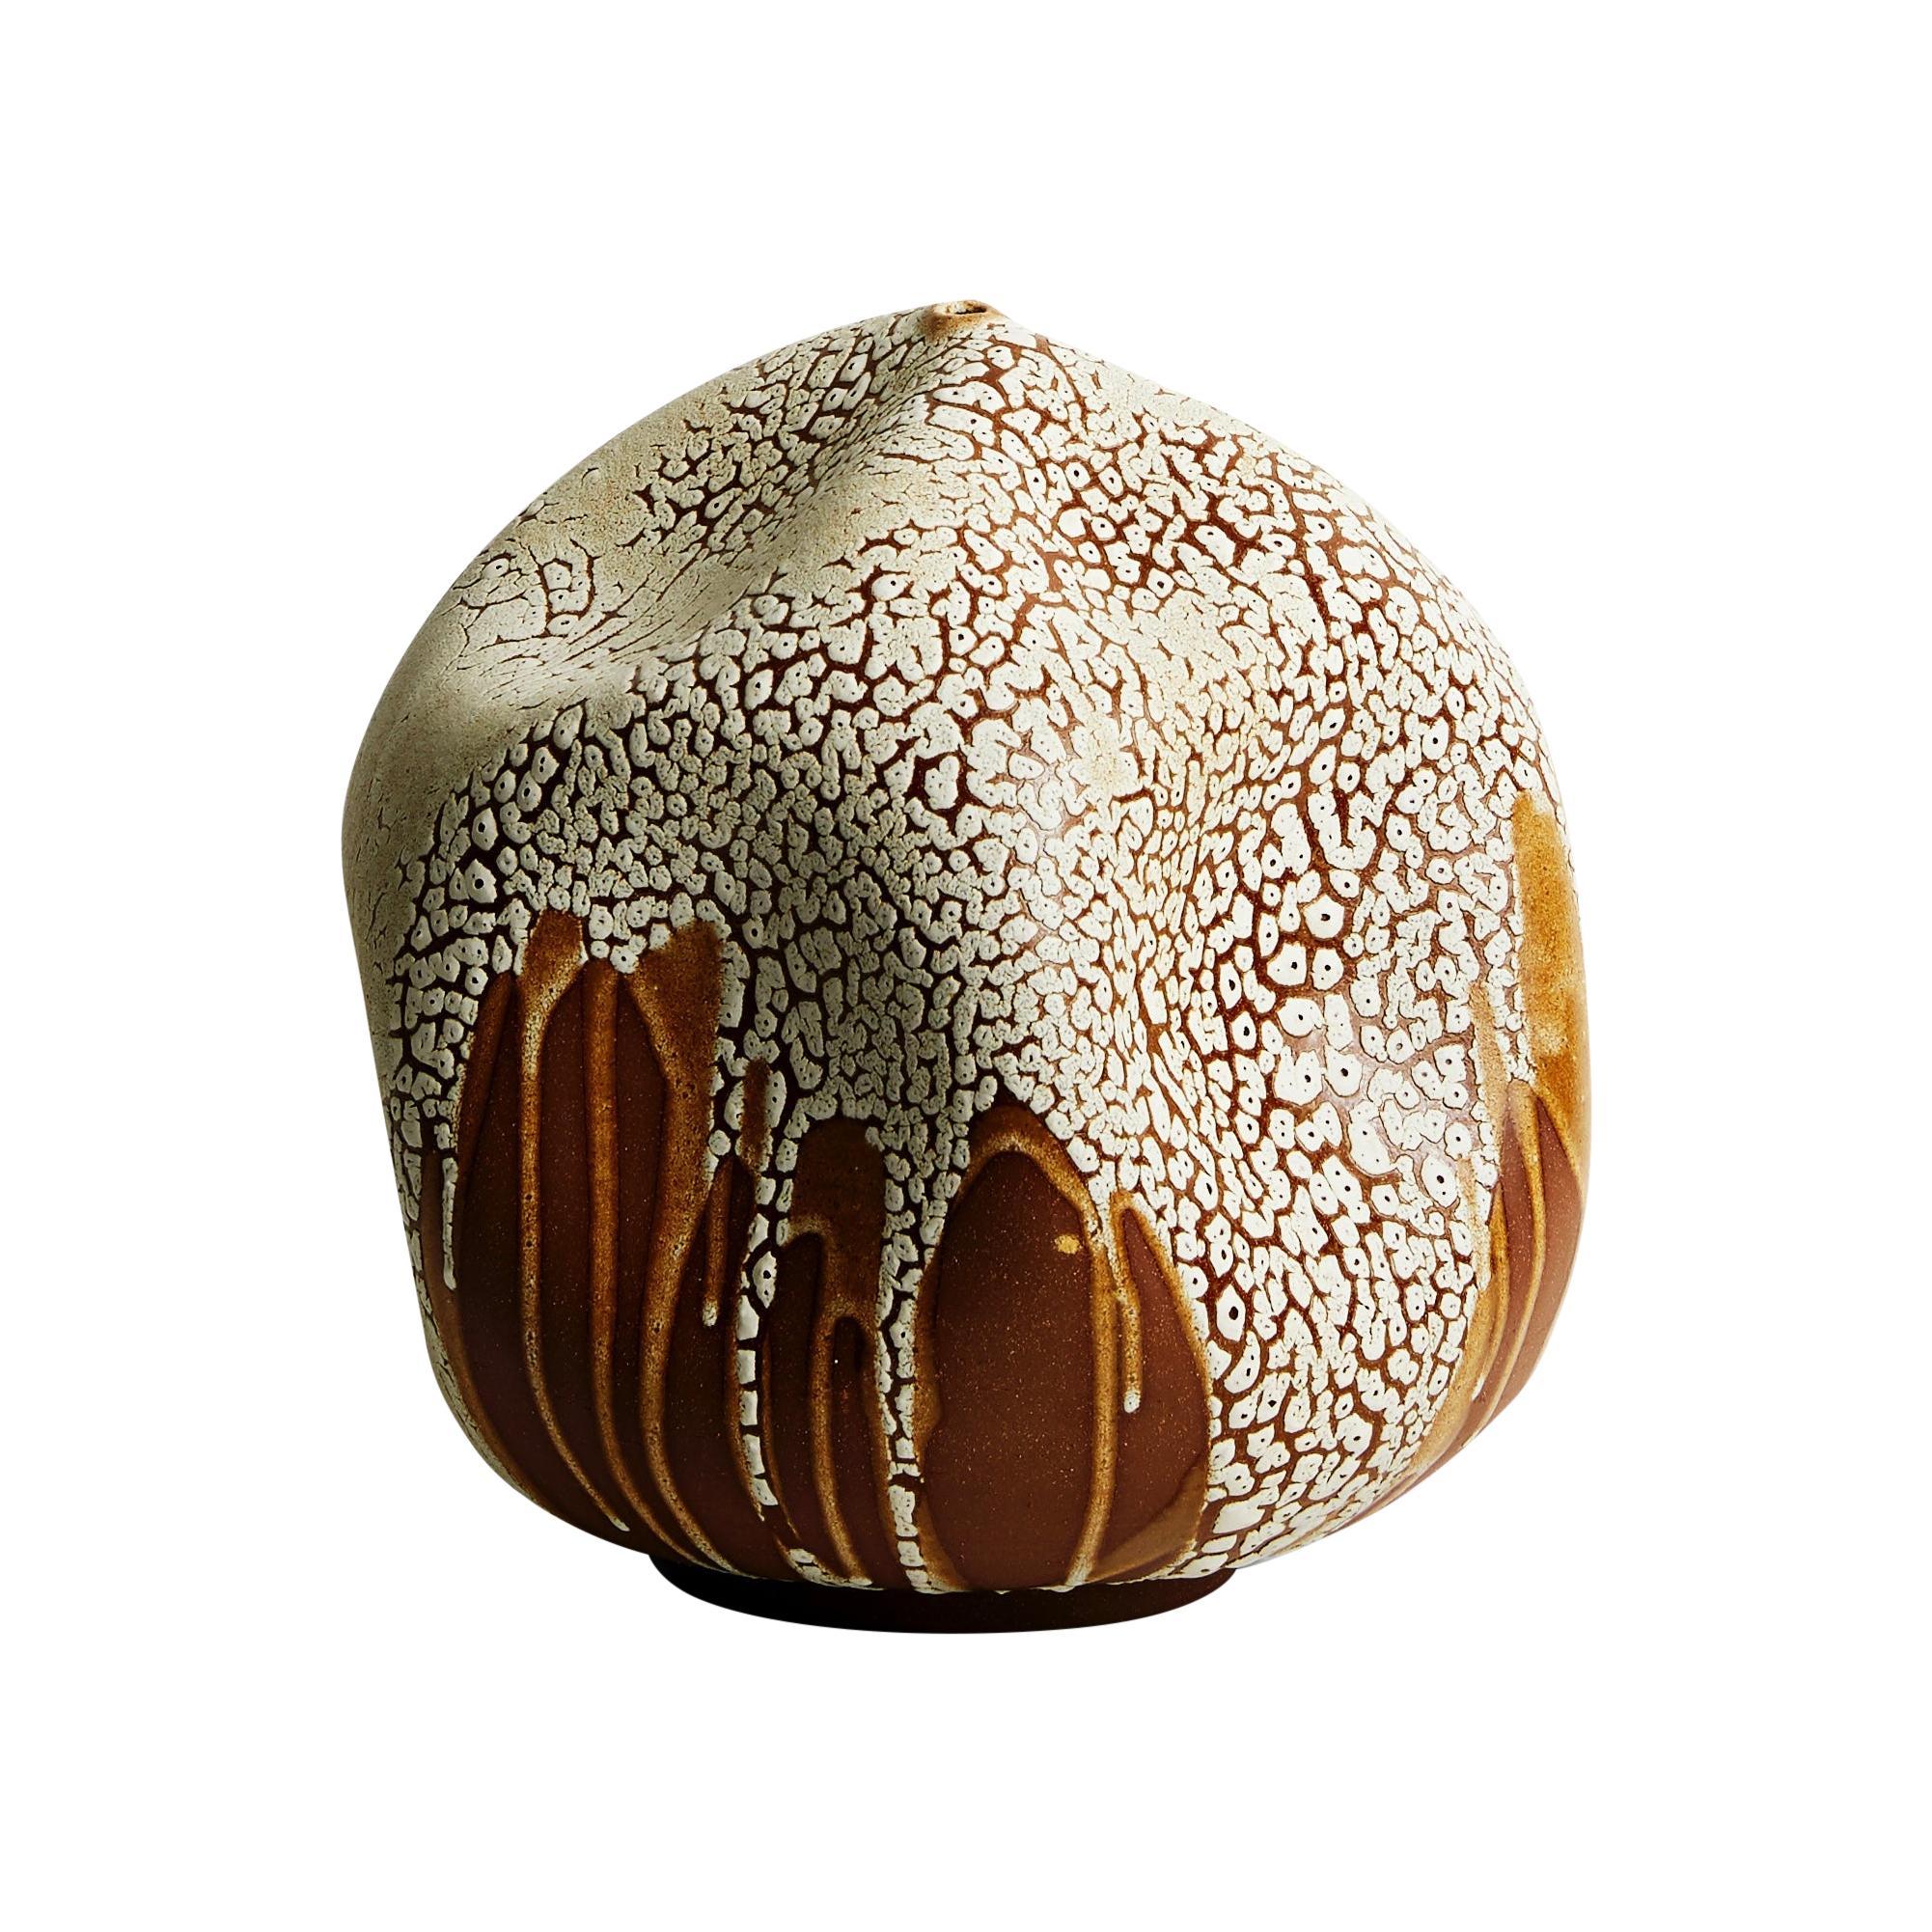 Skoby Joe Textured Ceramic Vessel Wabi Sabi Mid-Century Modern Sculpture